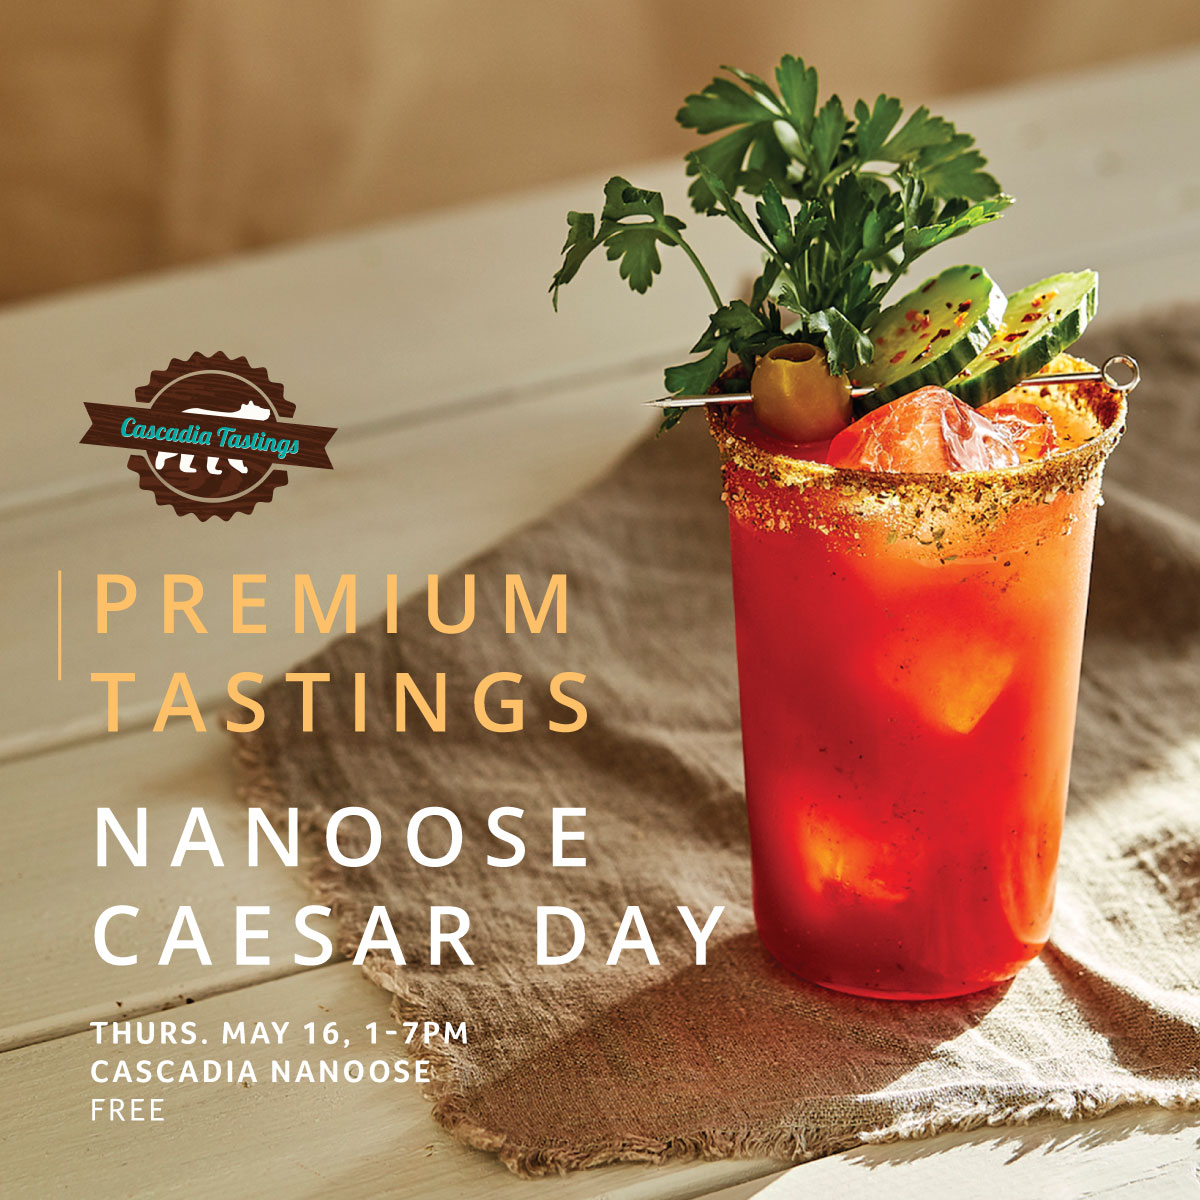 Cascadia-Nanoose-Premium-Tastings_Caesar-Day_Web.jpg